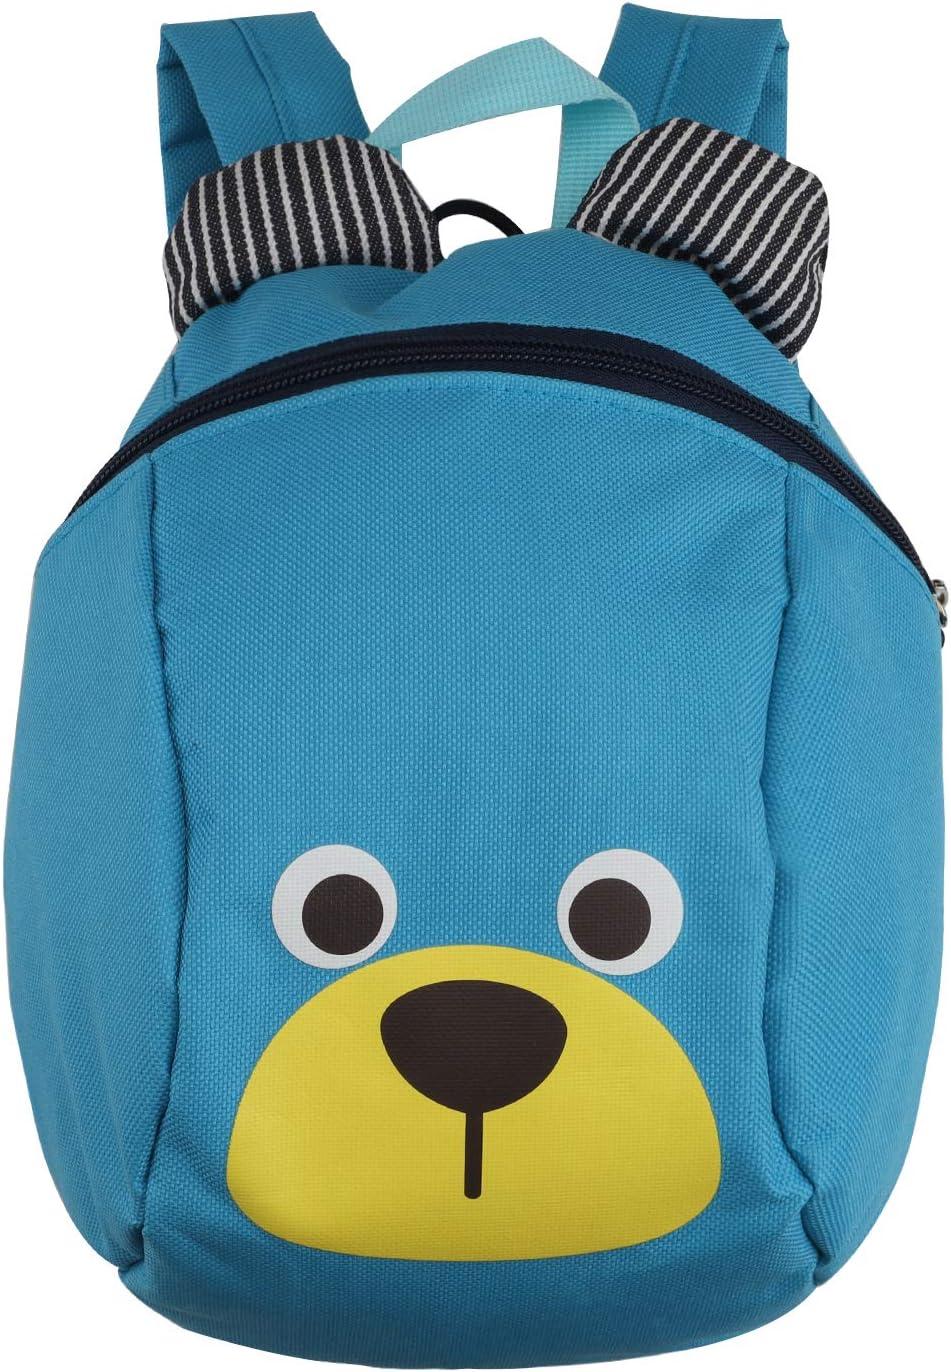 Mochila para niños,TEAMEN® Anti Pérdida de niños Mochila, Mini Oso Escuela Mochila,para bebé niño niña pequeños 1 – 3 AñOS(Azul Claro